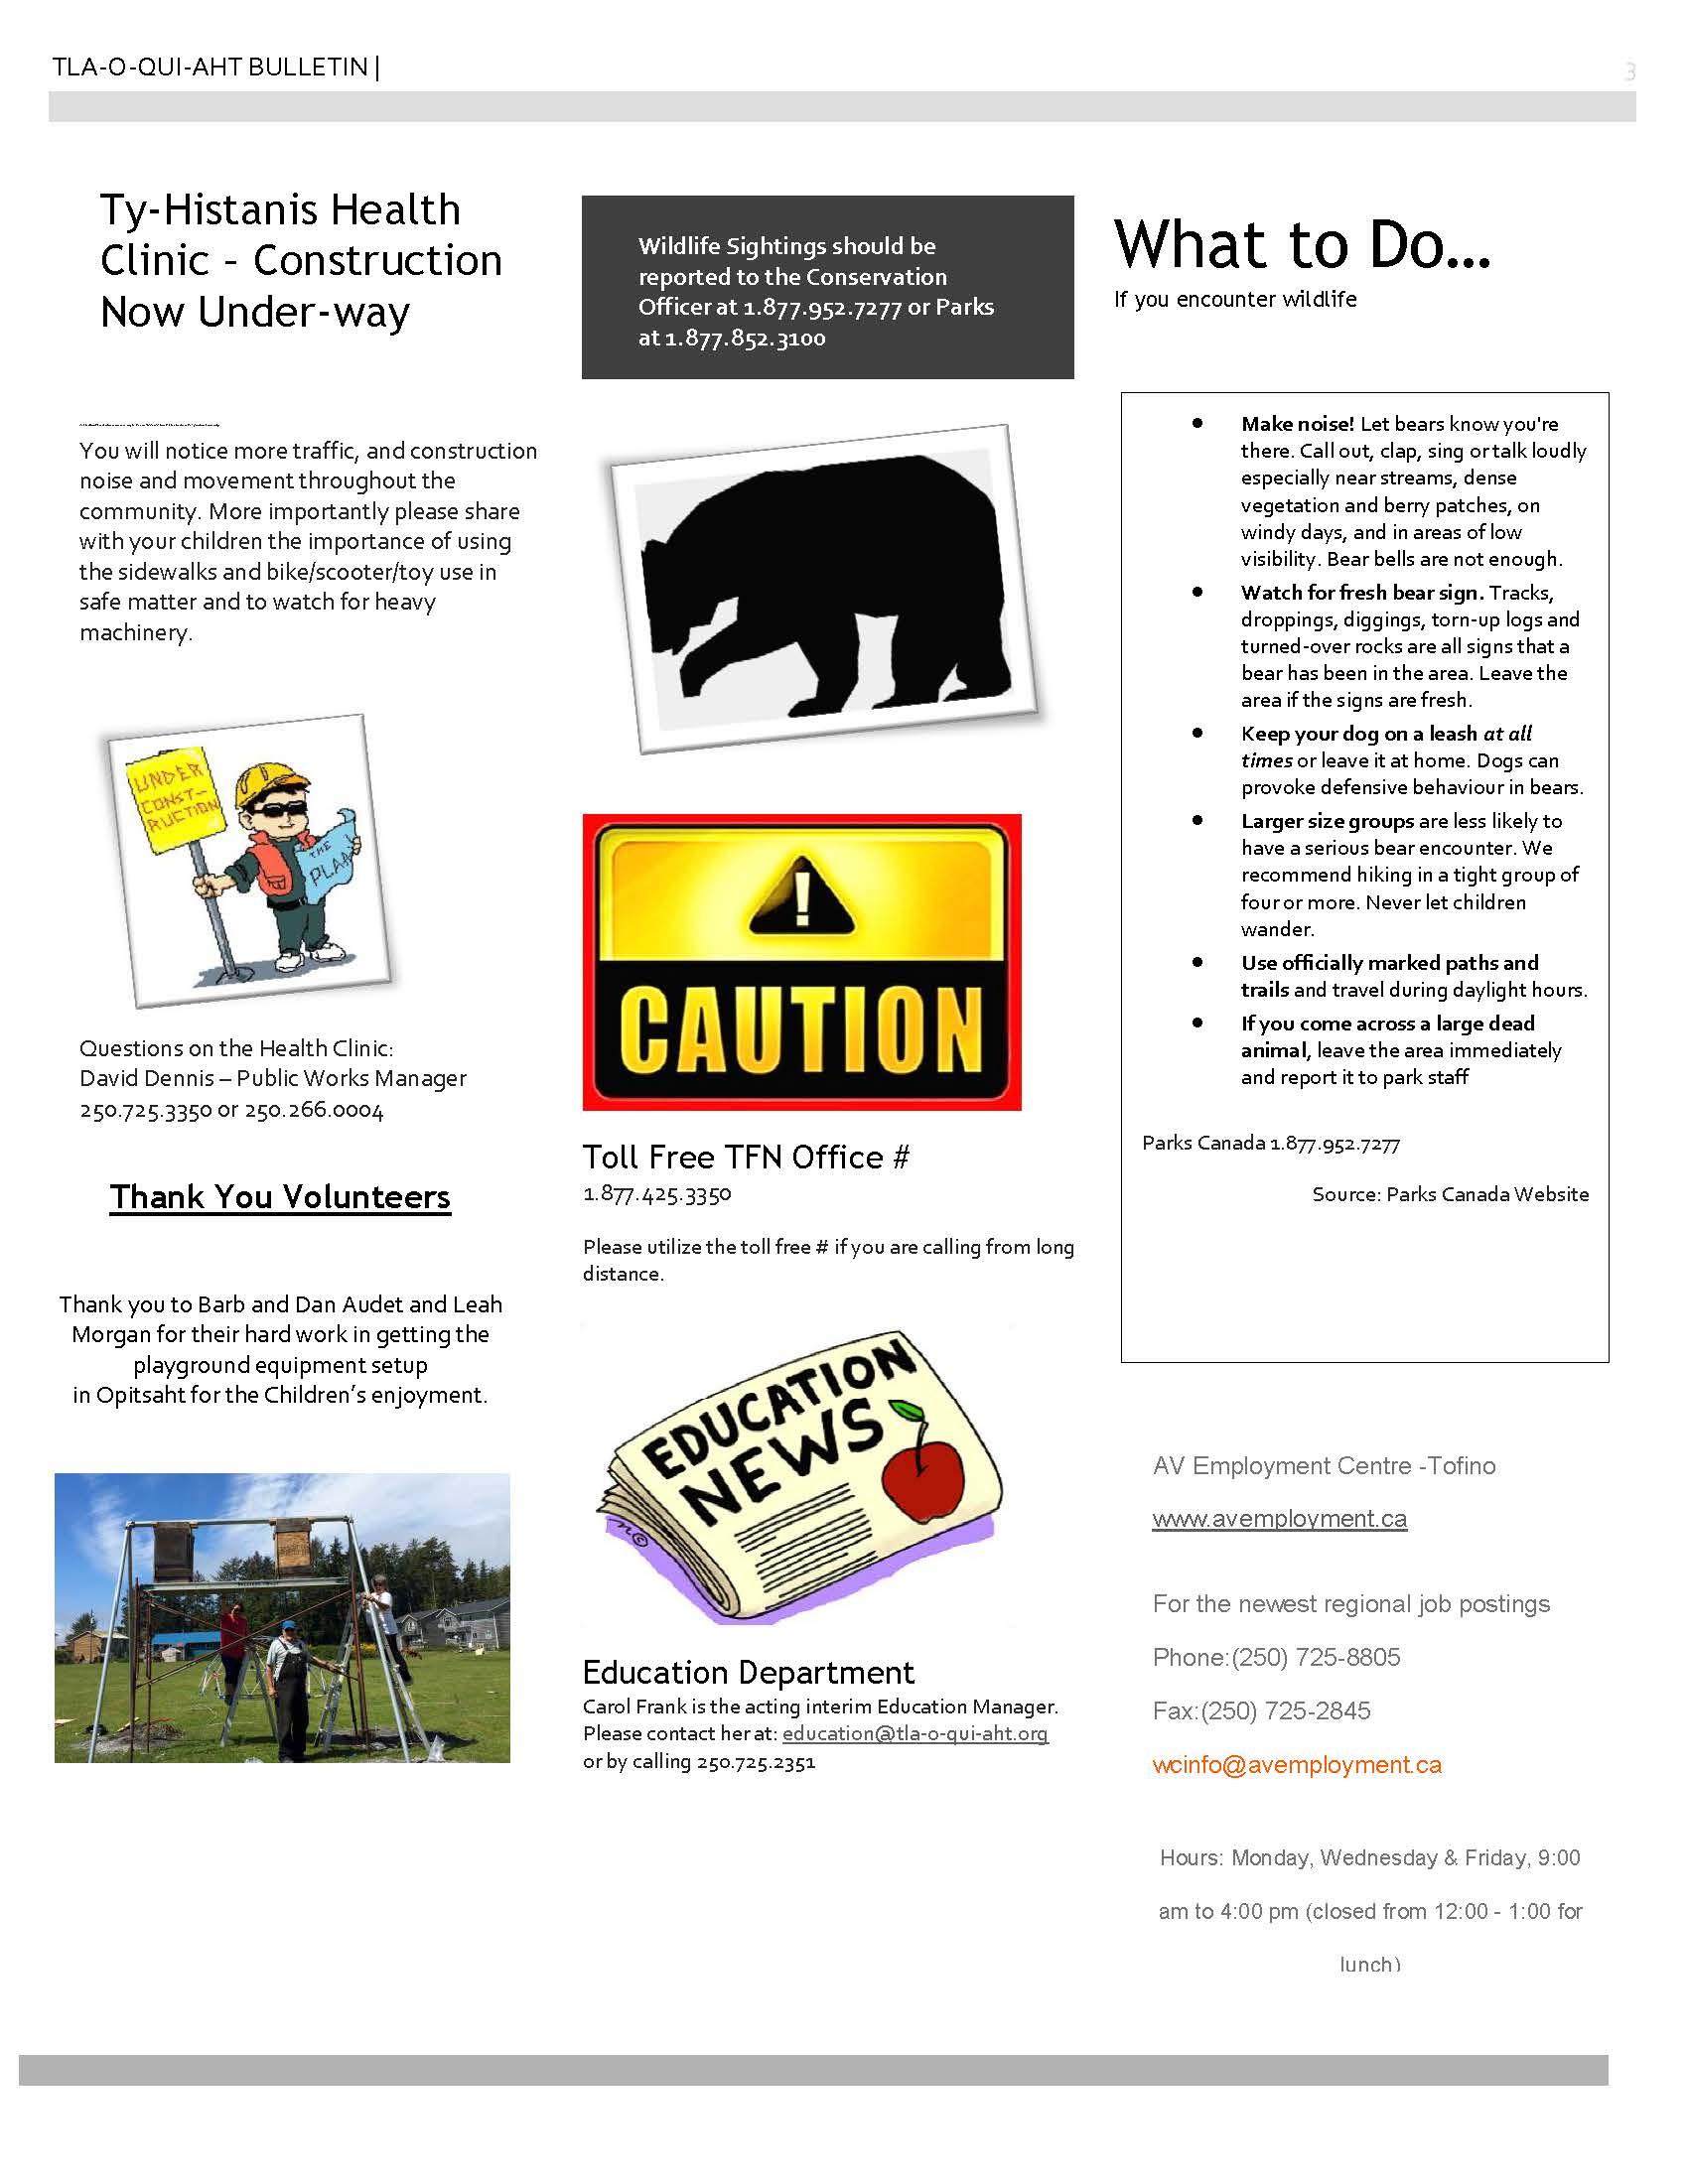 TFN Bulletin June 1-2016_Page_03.jpg